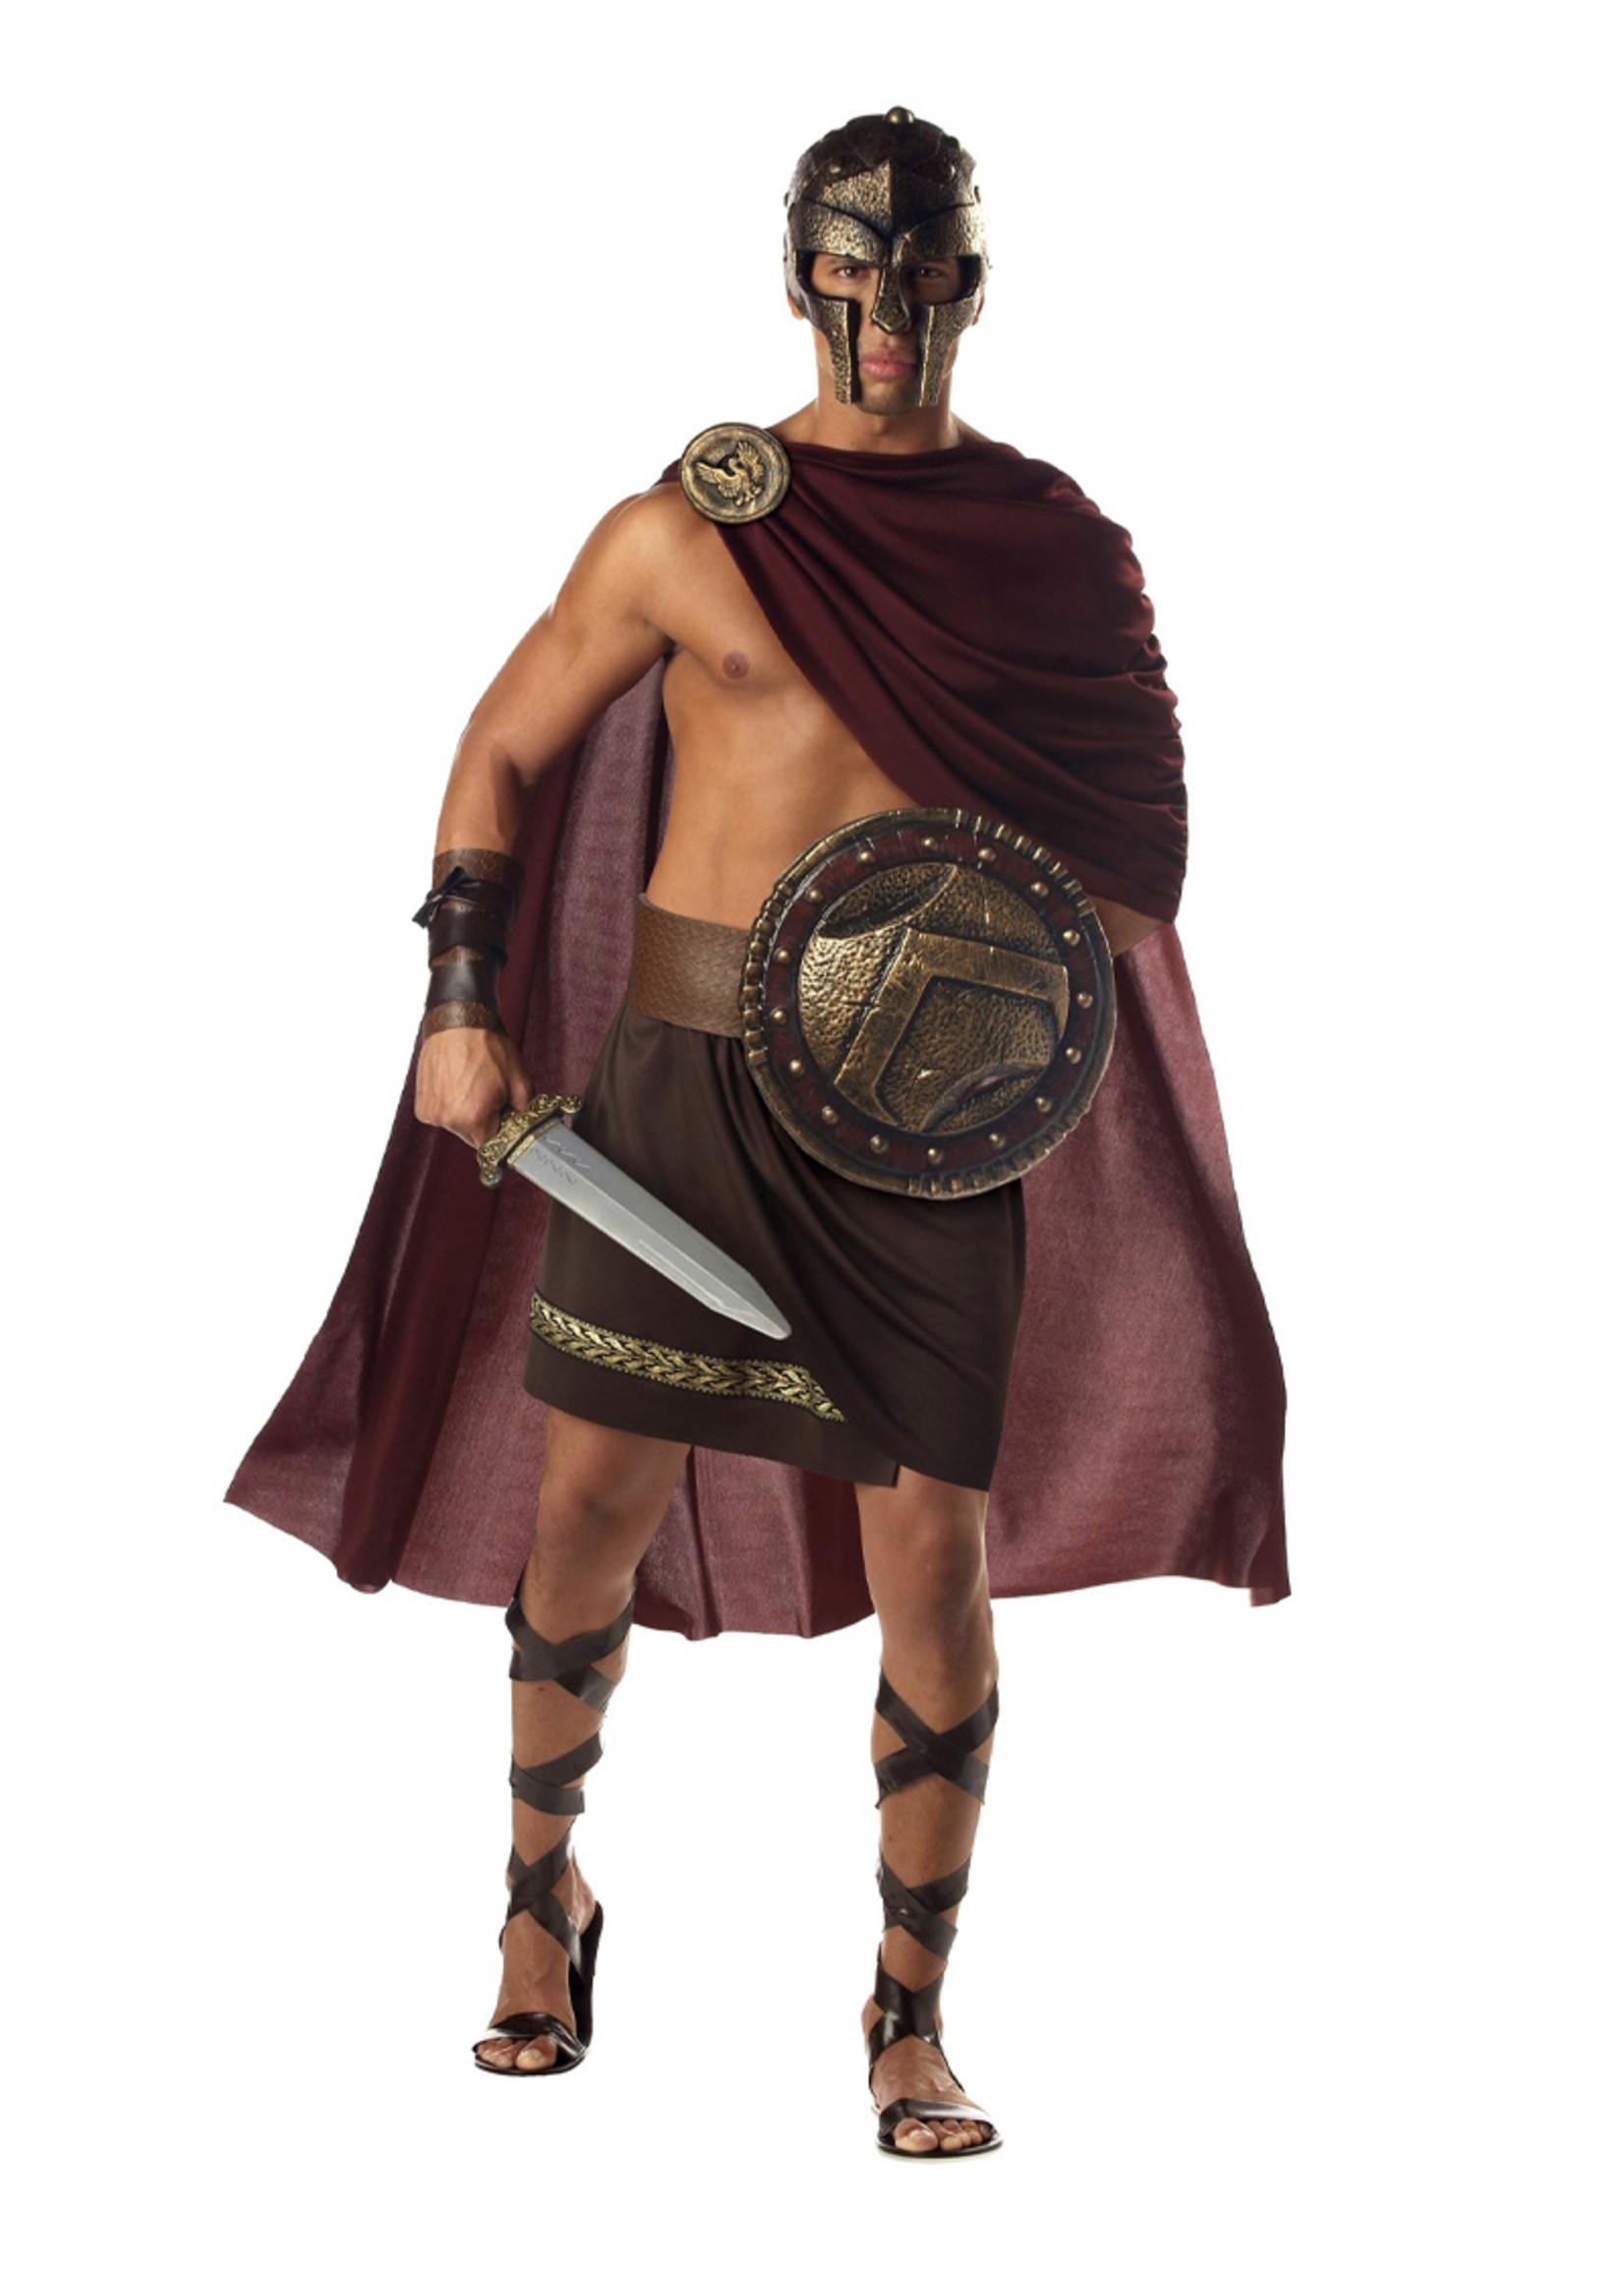 Spartan Warrior Costume - Men's